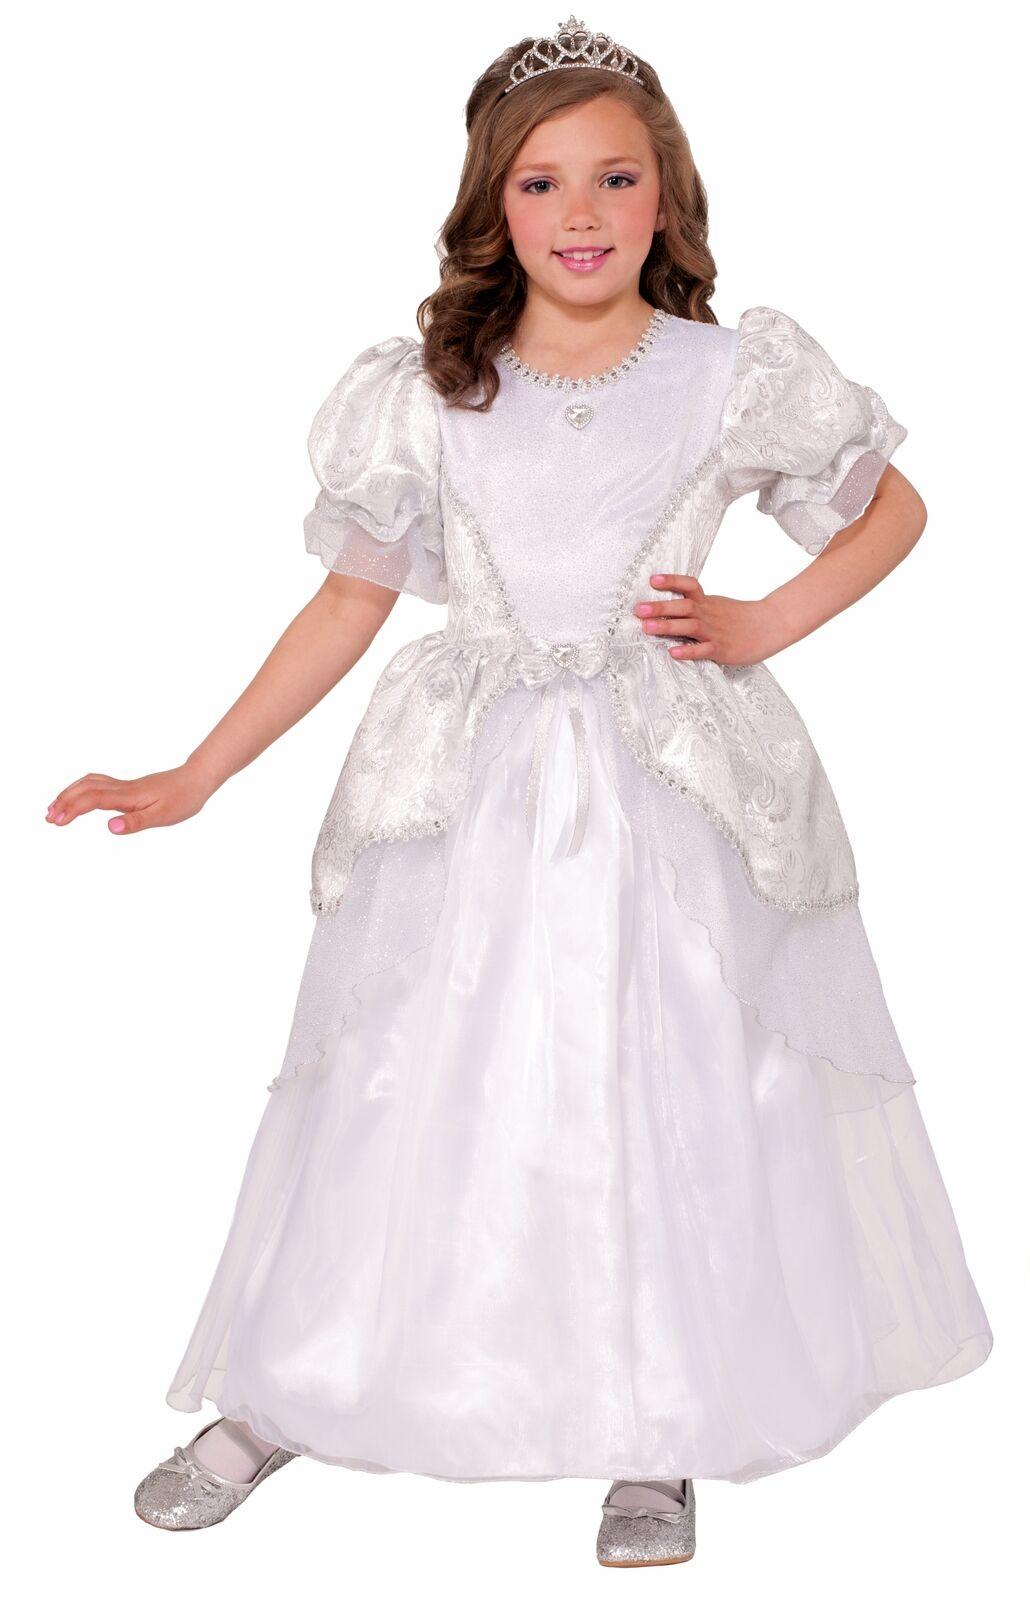 Deluxe Bride Princess Pearl White Wedding Dress Child Girls